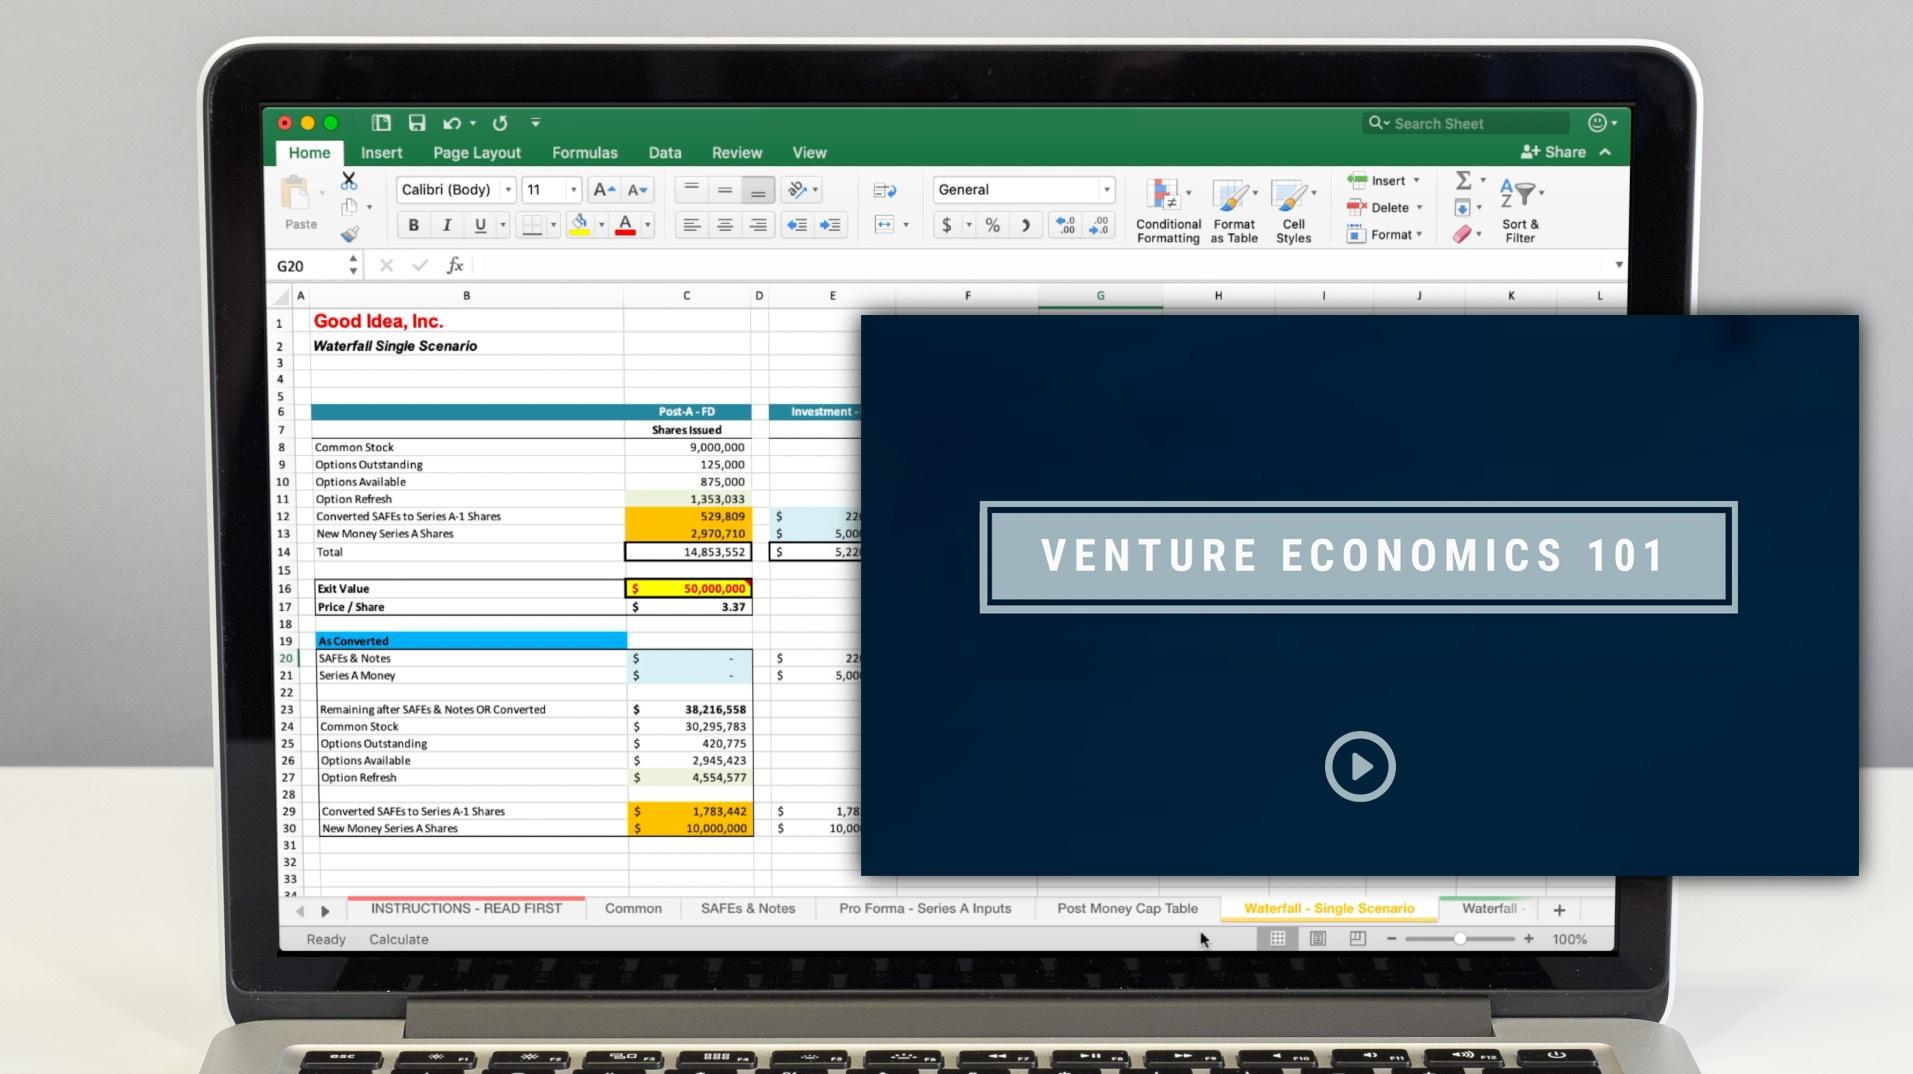 Venture Economics 101 + Startup Cap Tables